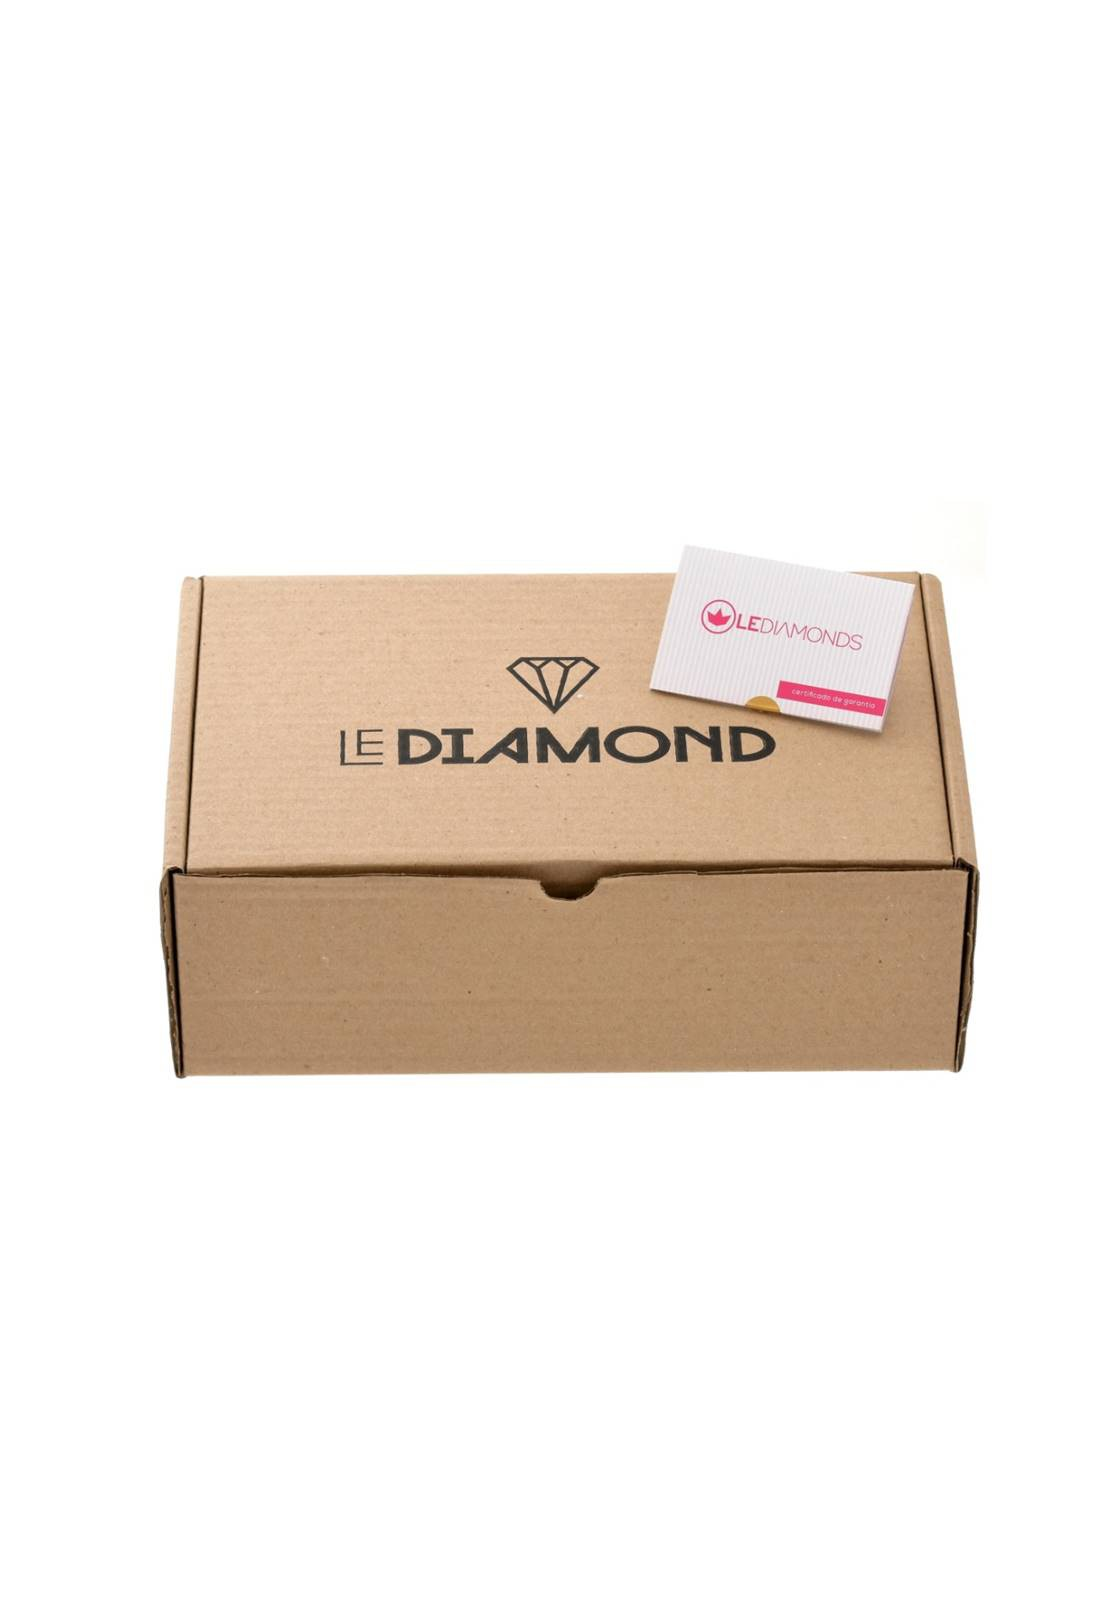 Brinco Le Diamond Argola Apolline Vermelho